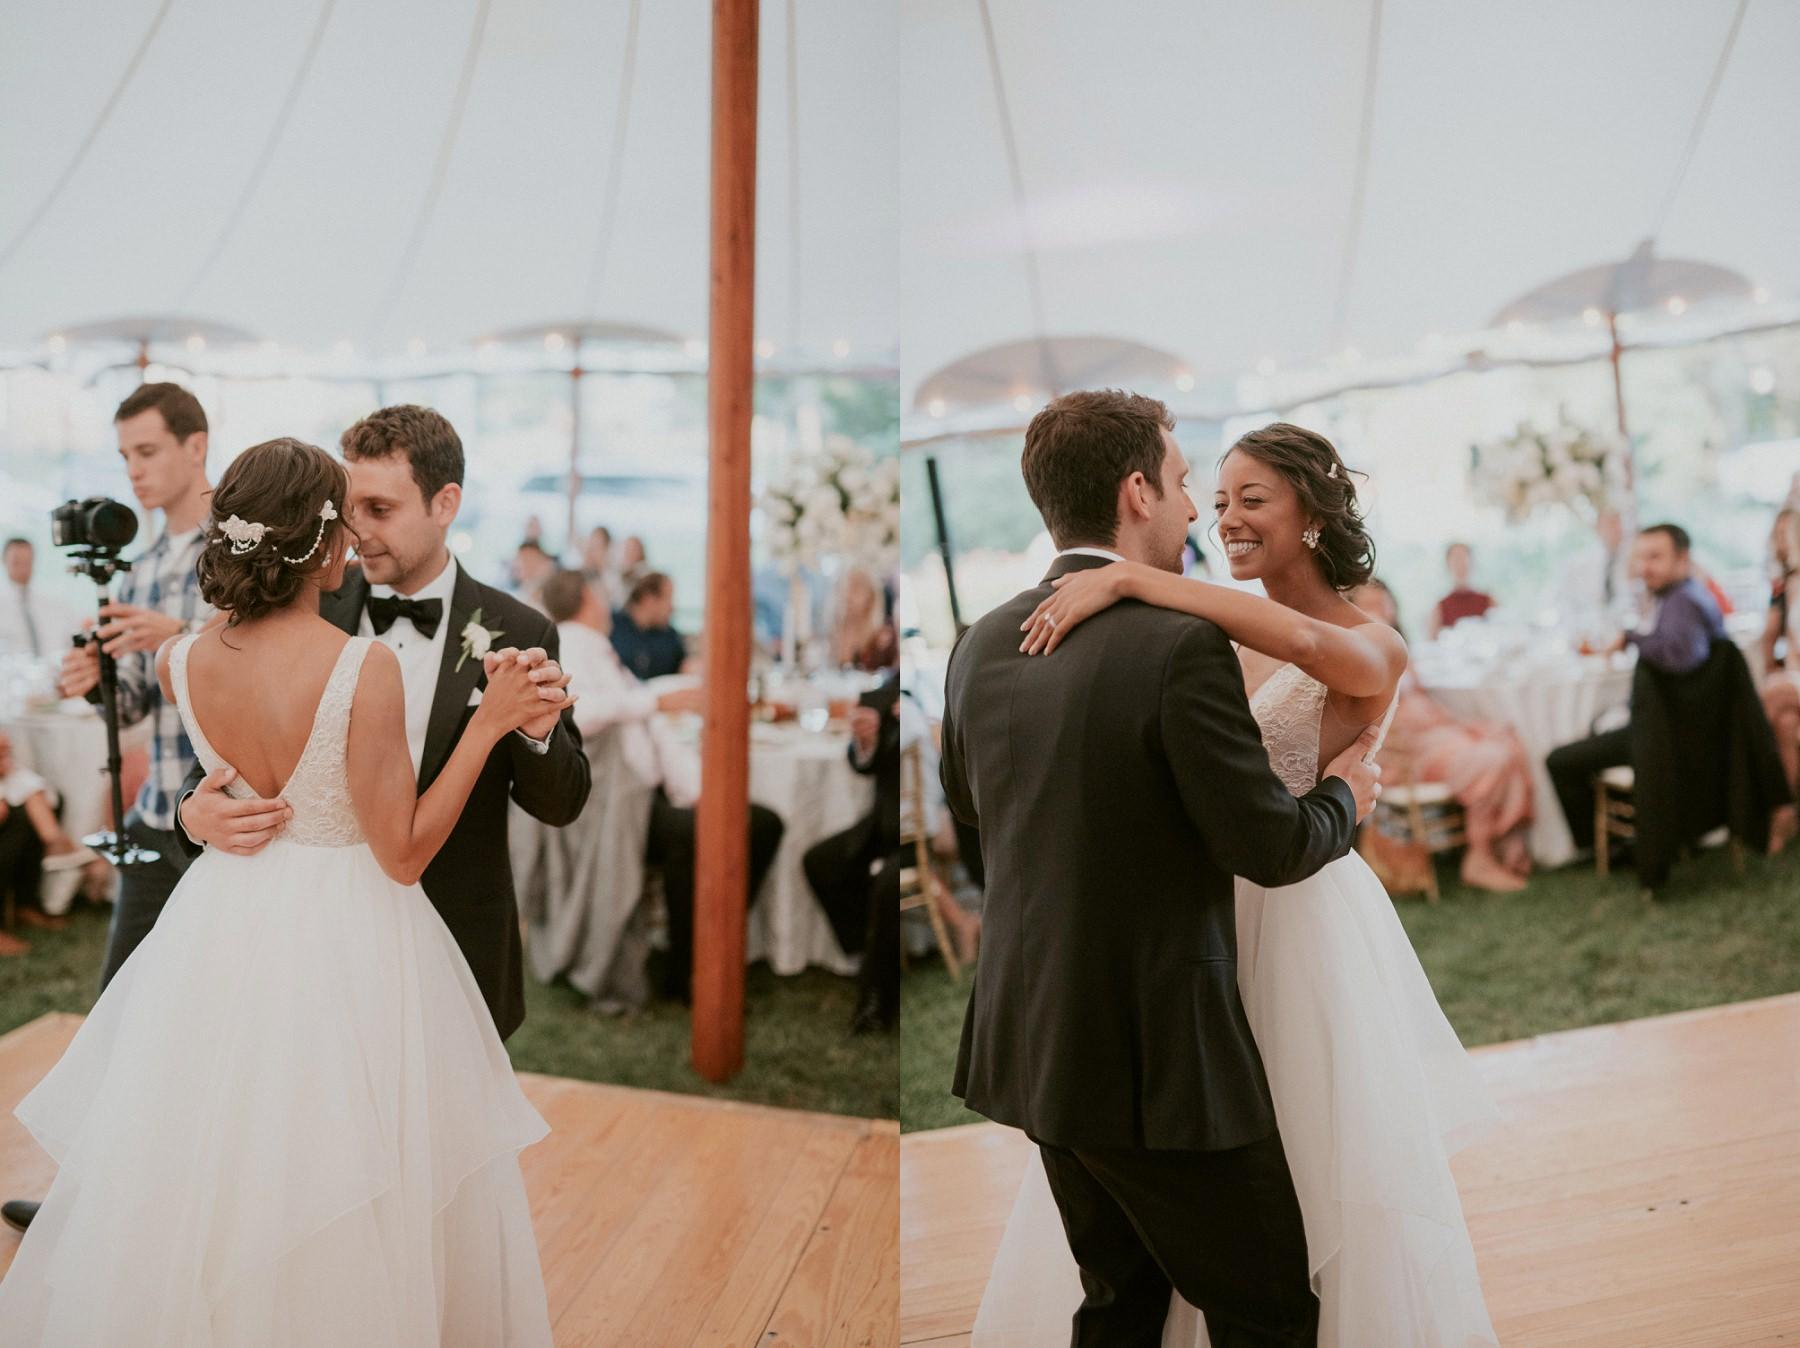 Lake Geneva WI Wedding Photographer, Maxwell Mansion Lake Geneva WI, Mansion Wedding, Madison WI Wedding Photographer, Milwaukee WI Wedding Photographer